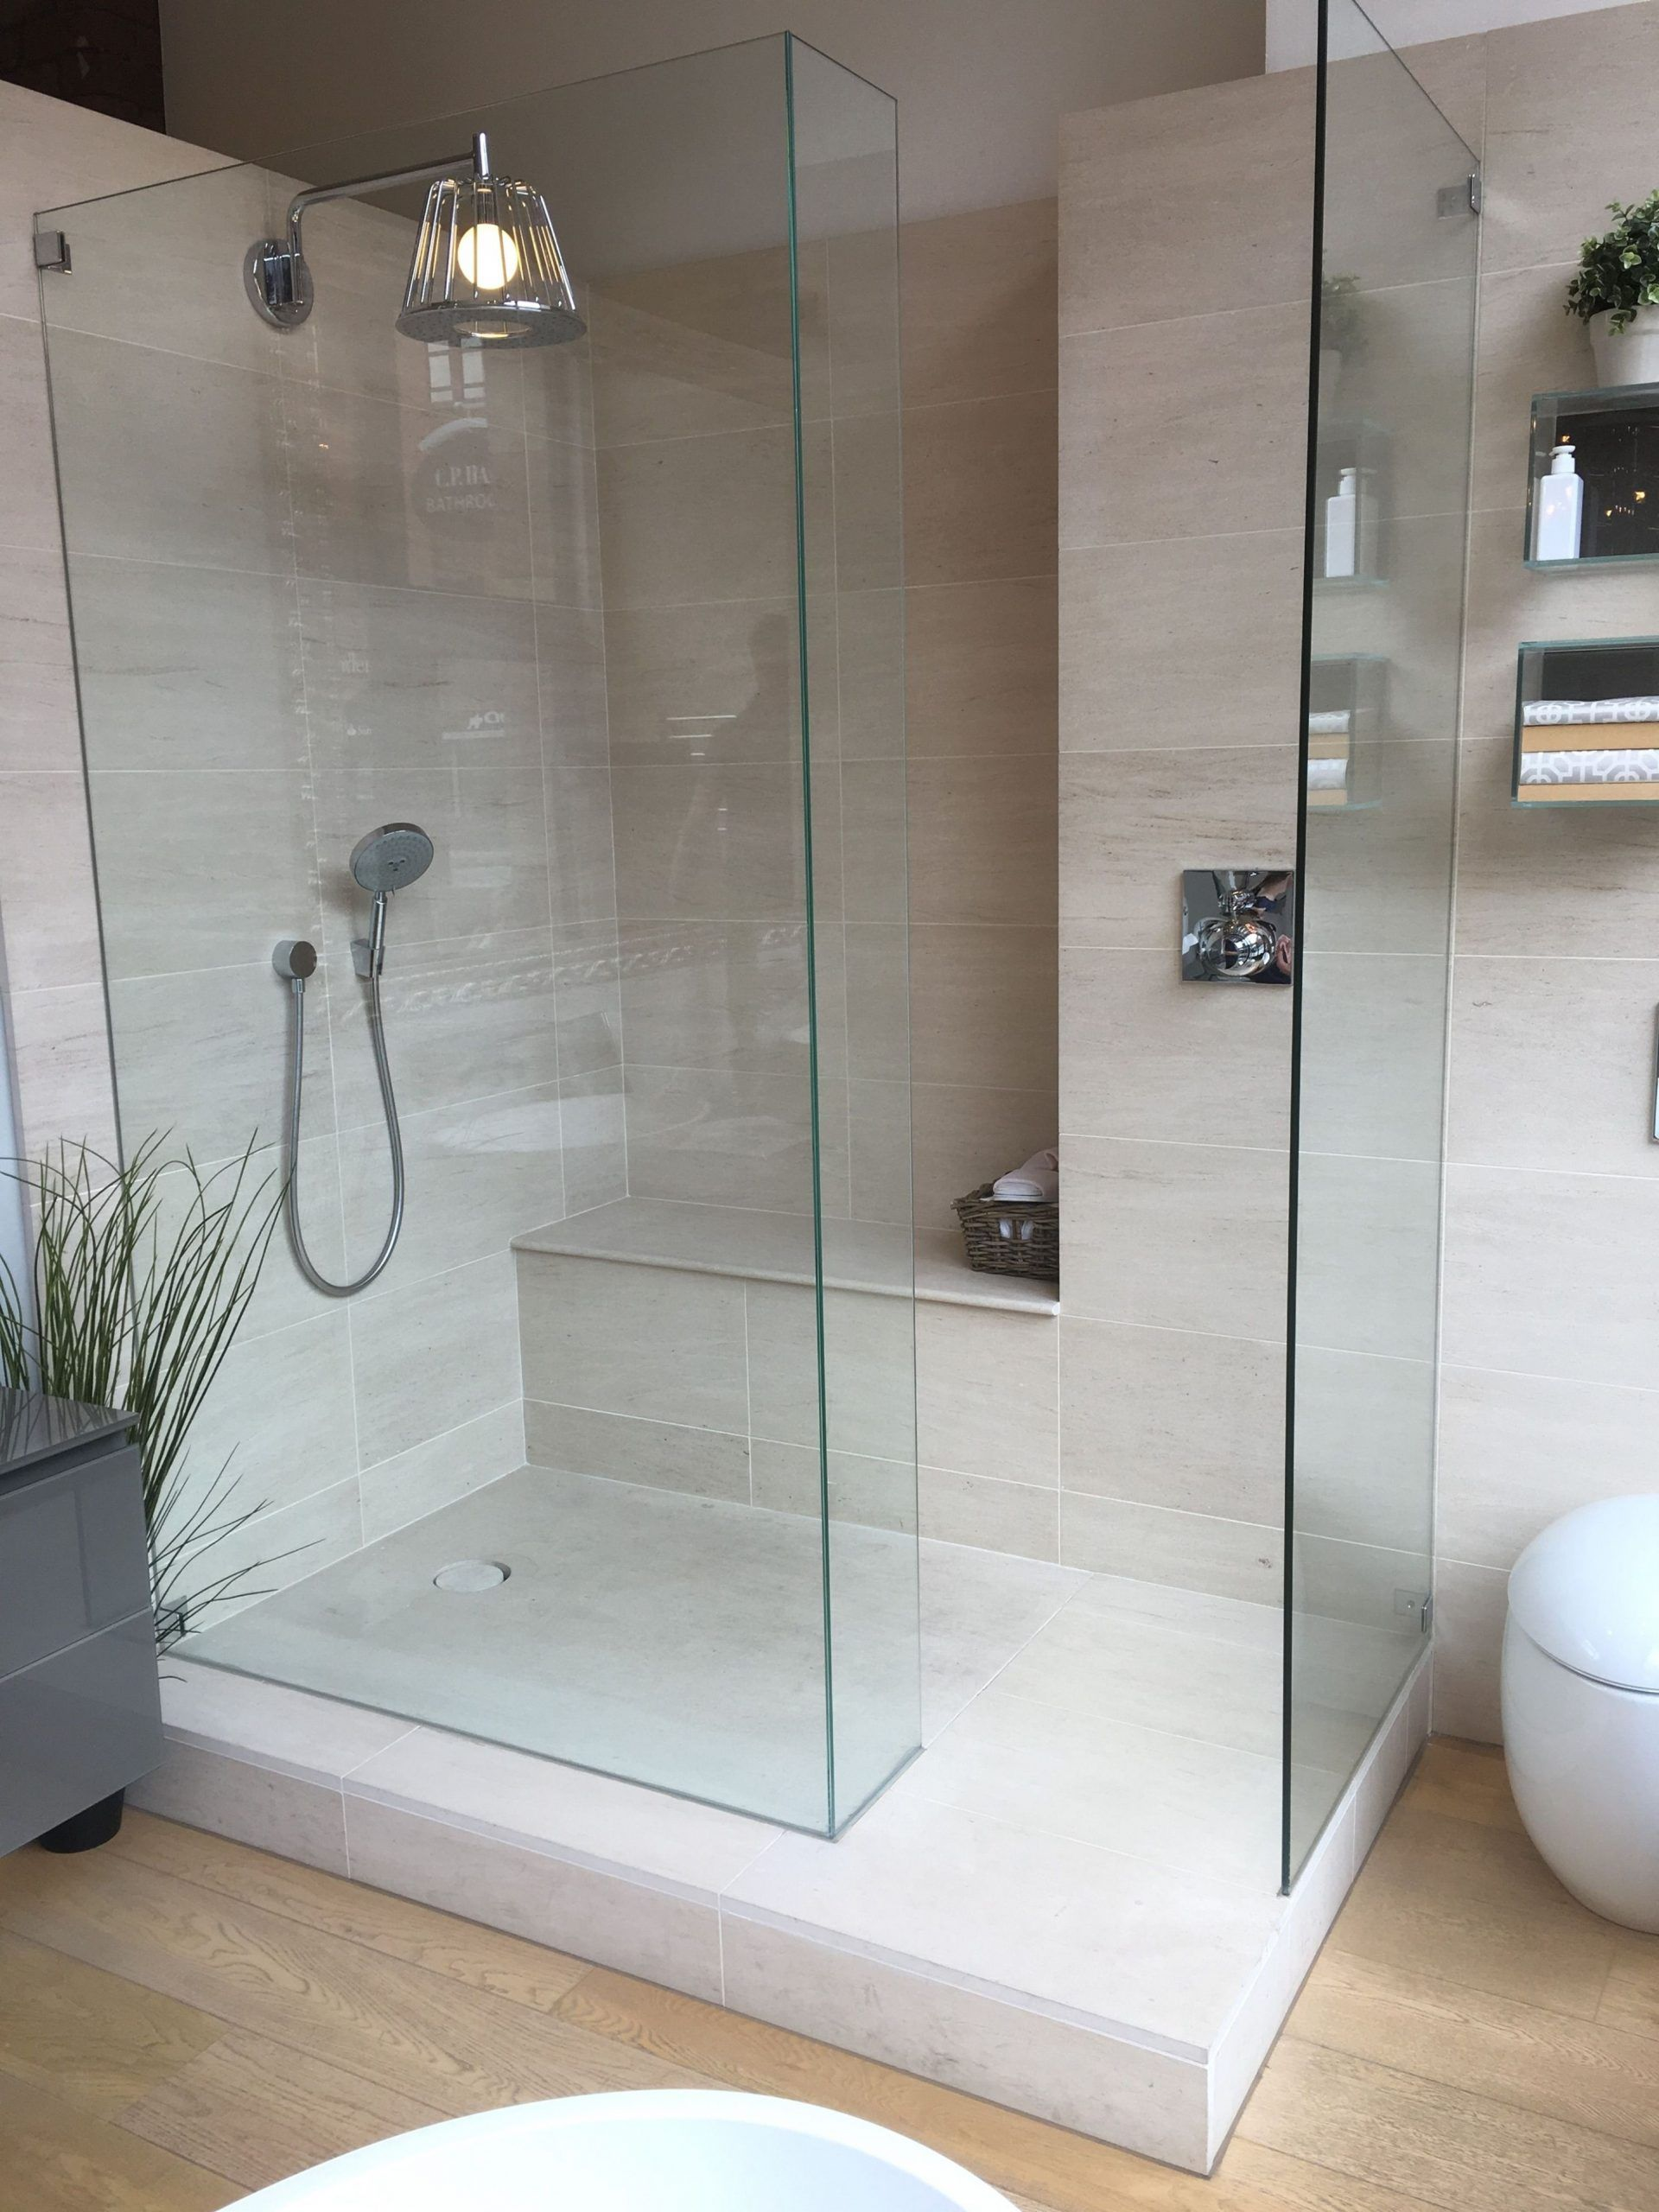 Remodeling Bathroom Design Software Free At Nerdwallet We Strive To Advice You Accomplish Banki Cheap Bathroom Remodel Half Bathroom Remodel Bathroom Interior